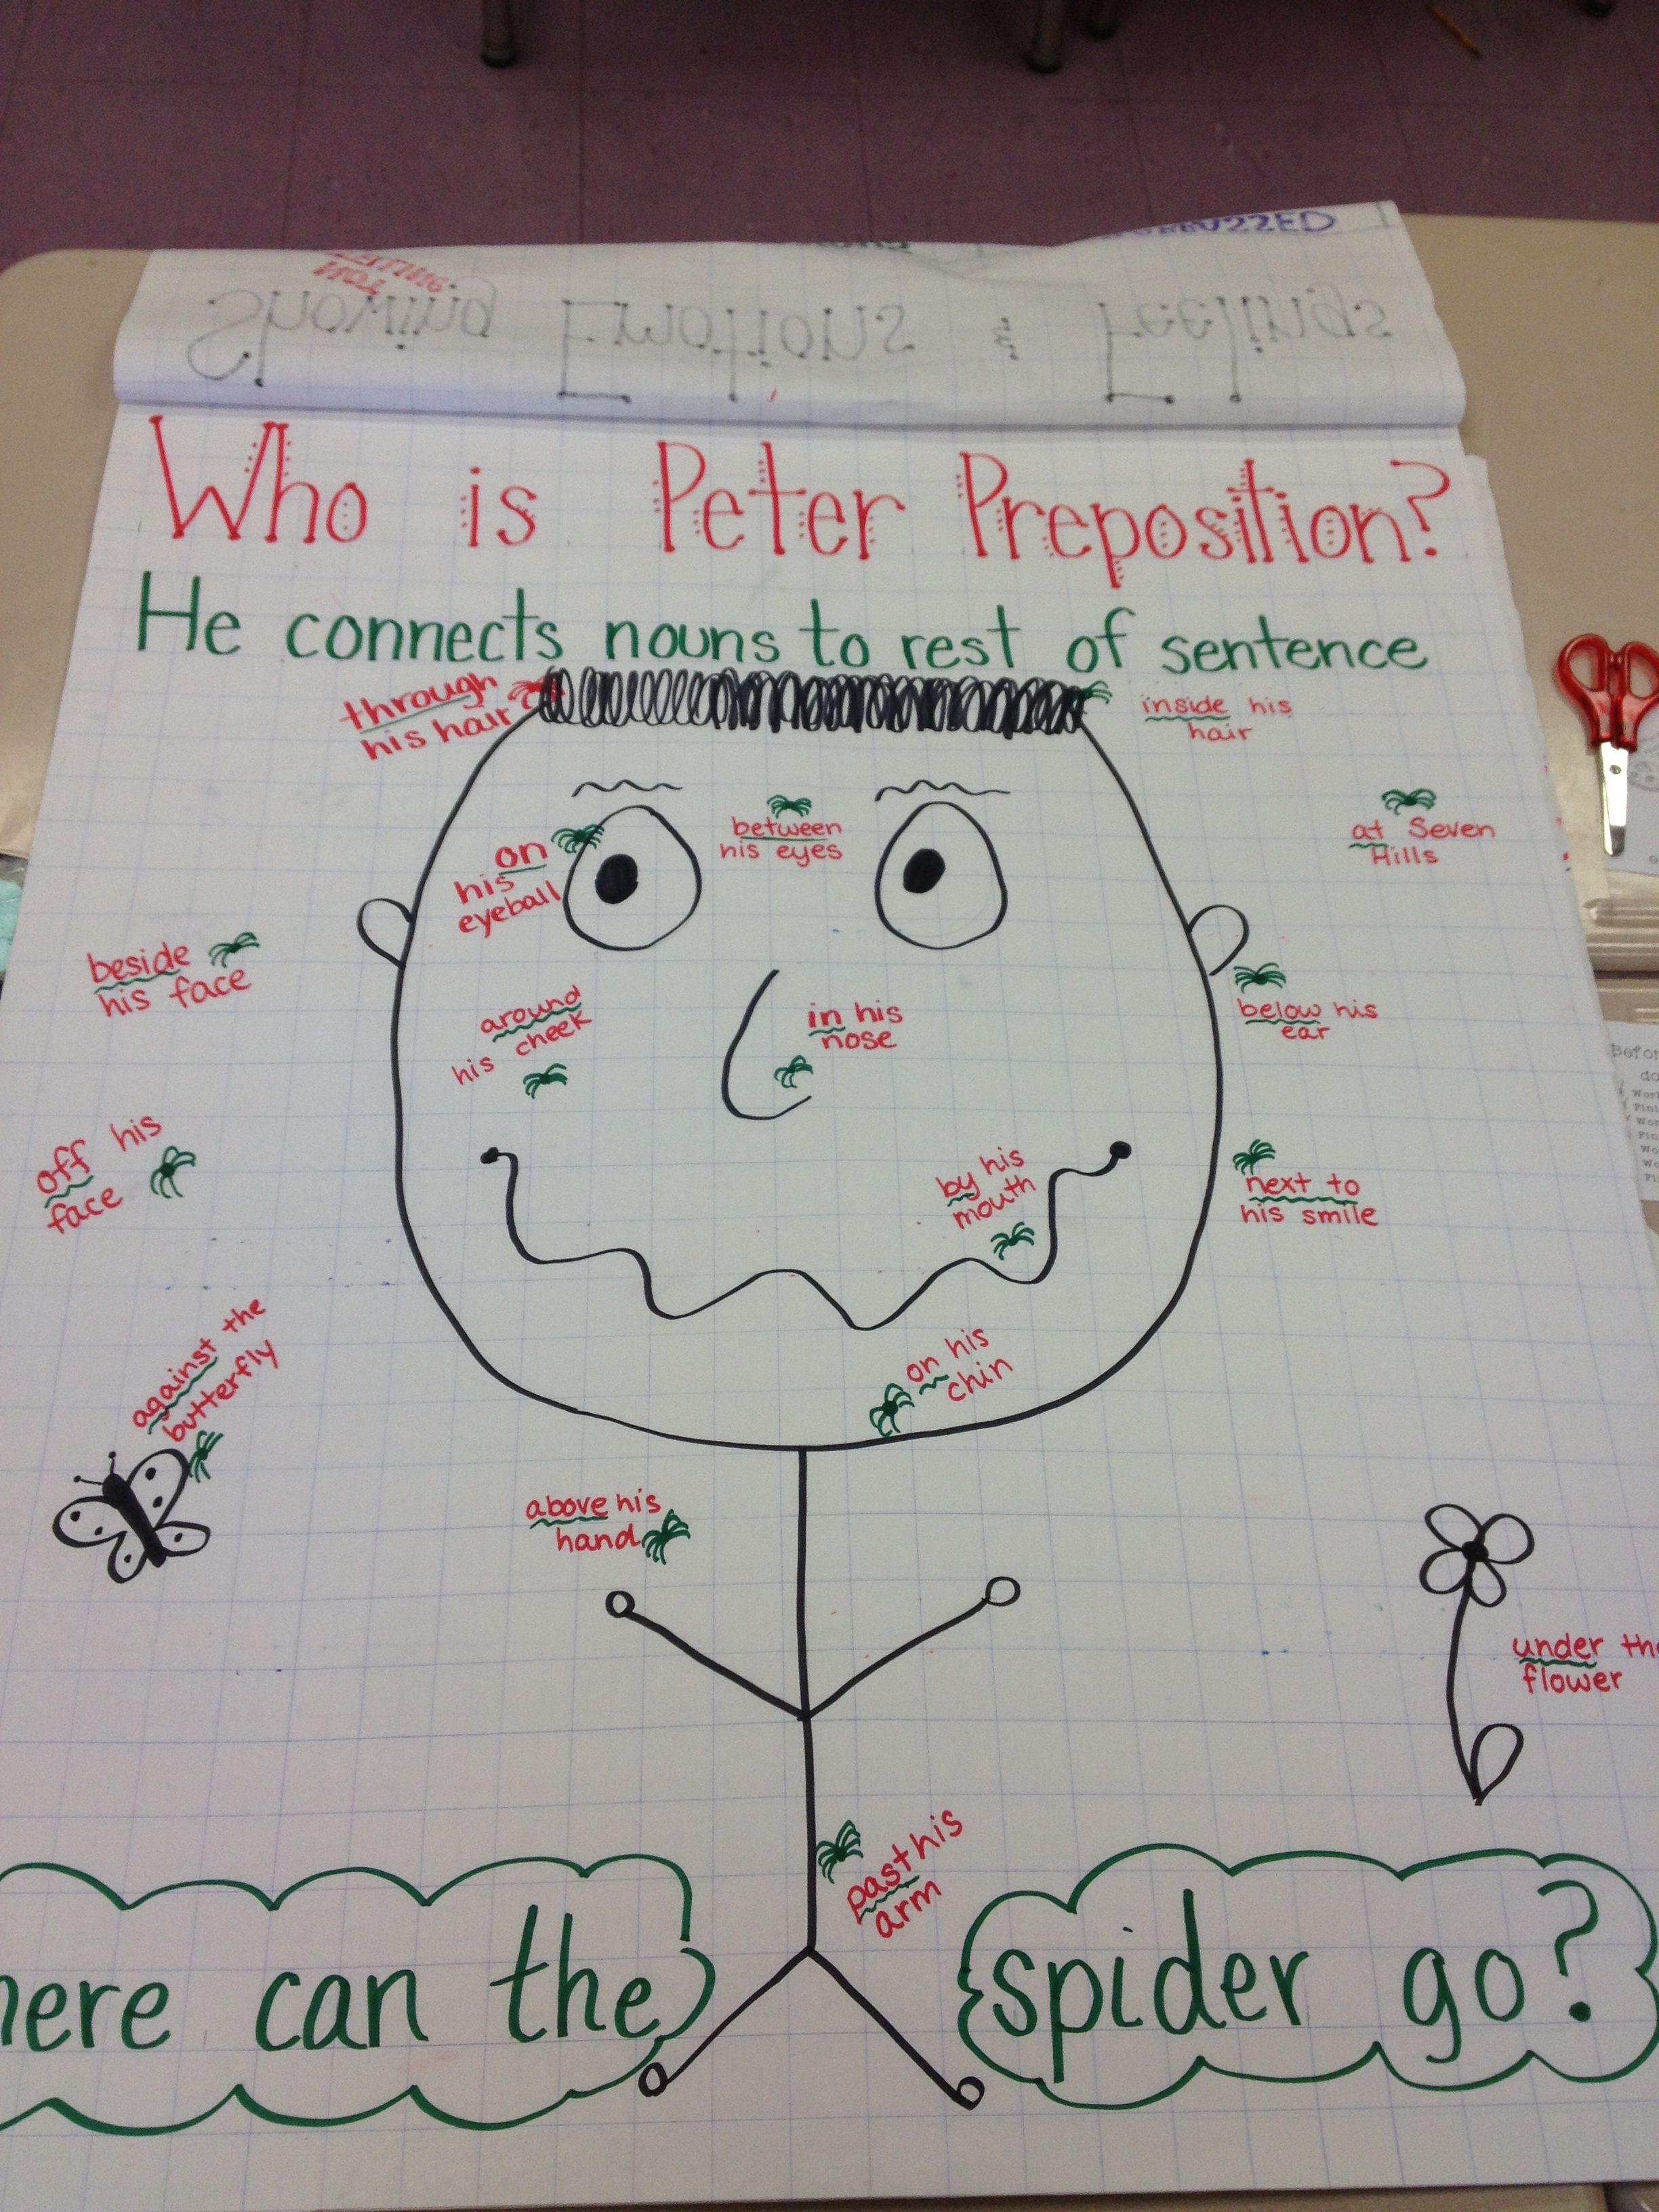 Peter Preposition